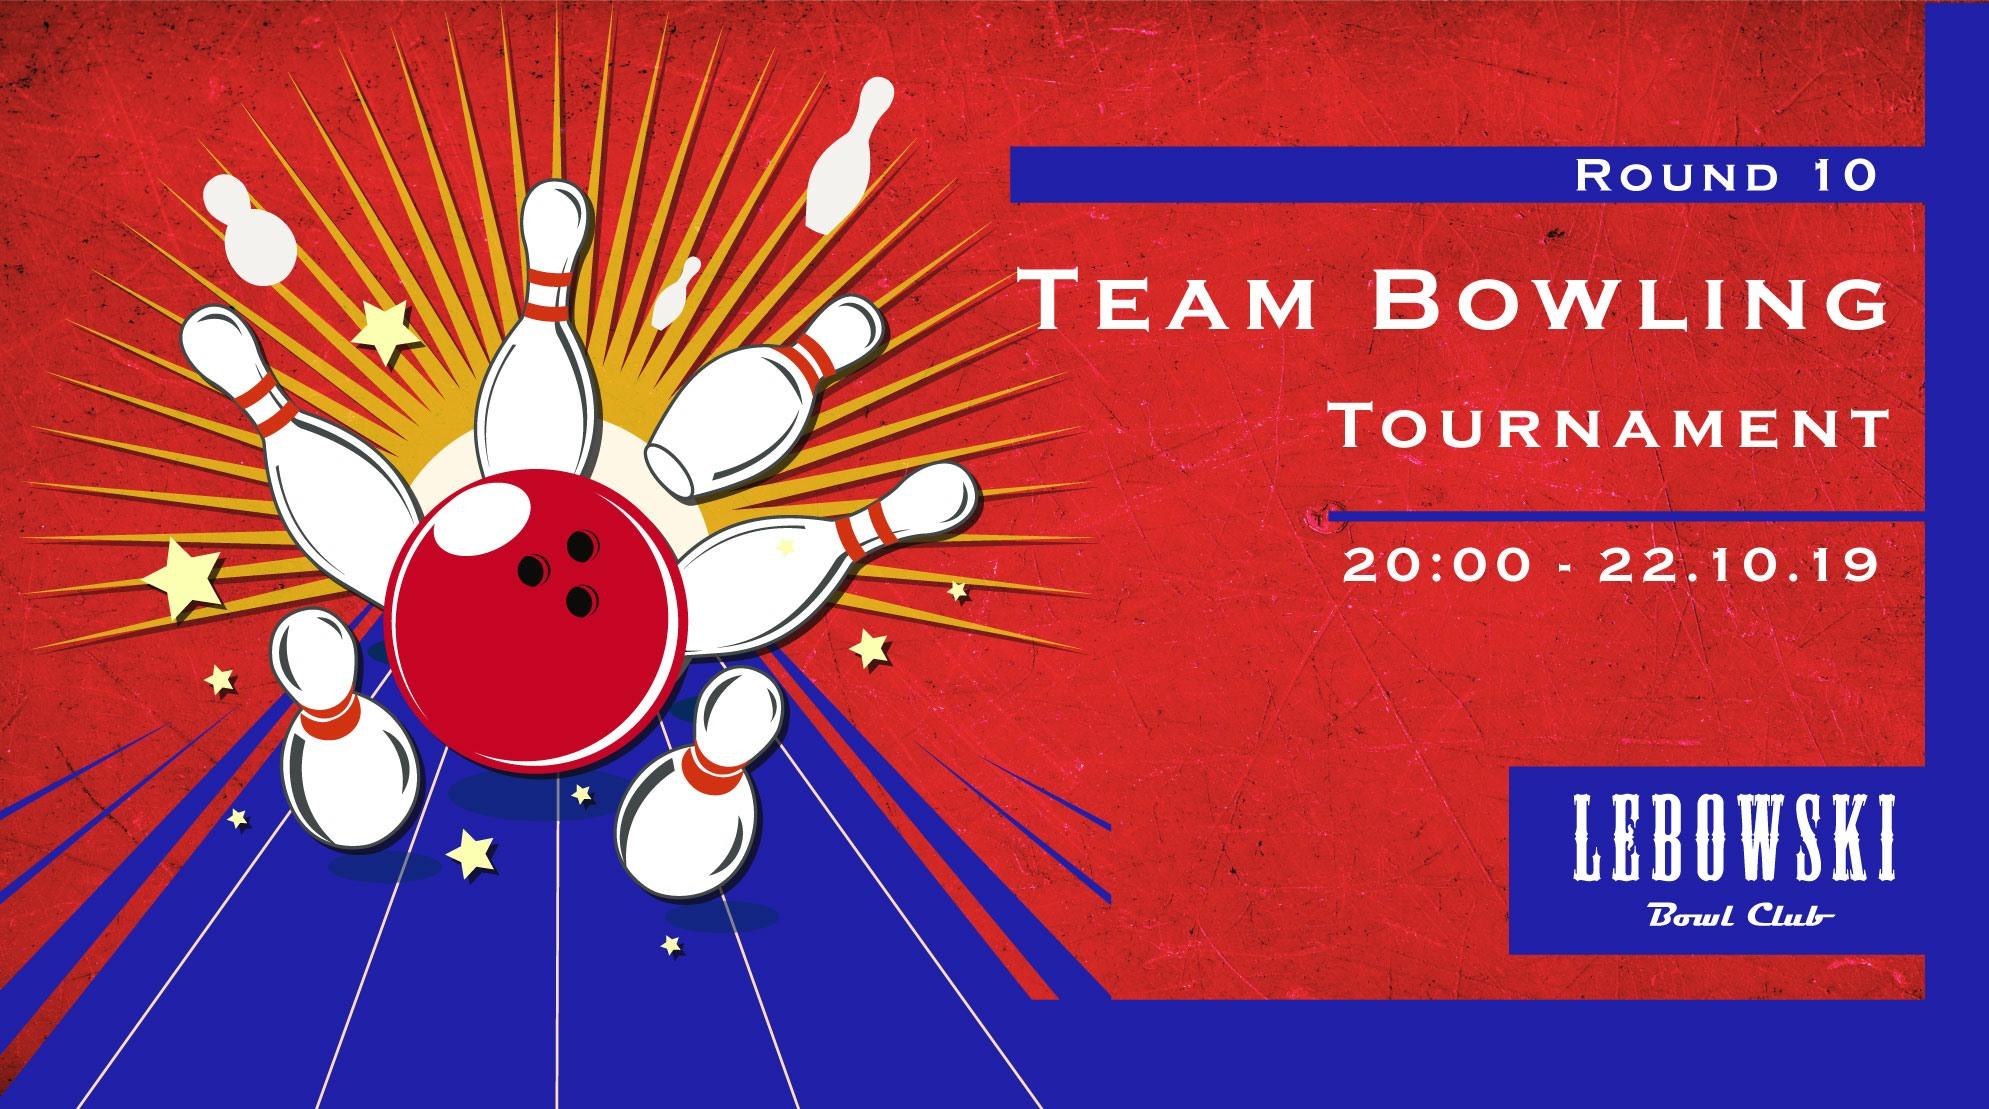 Bowling Team Tournament, Round #10 photo